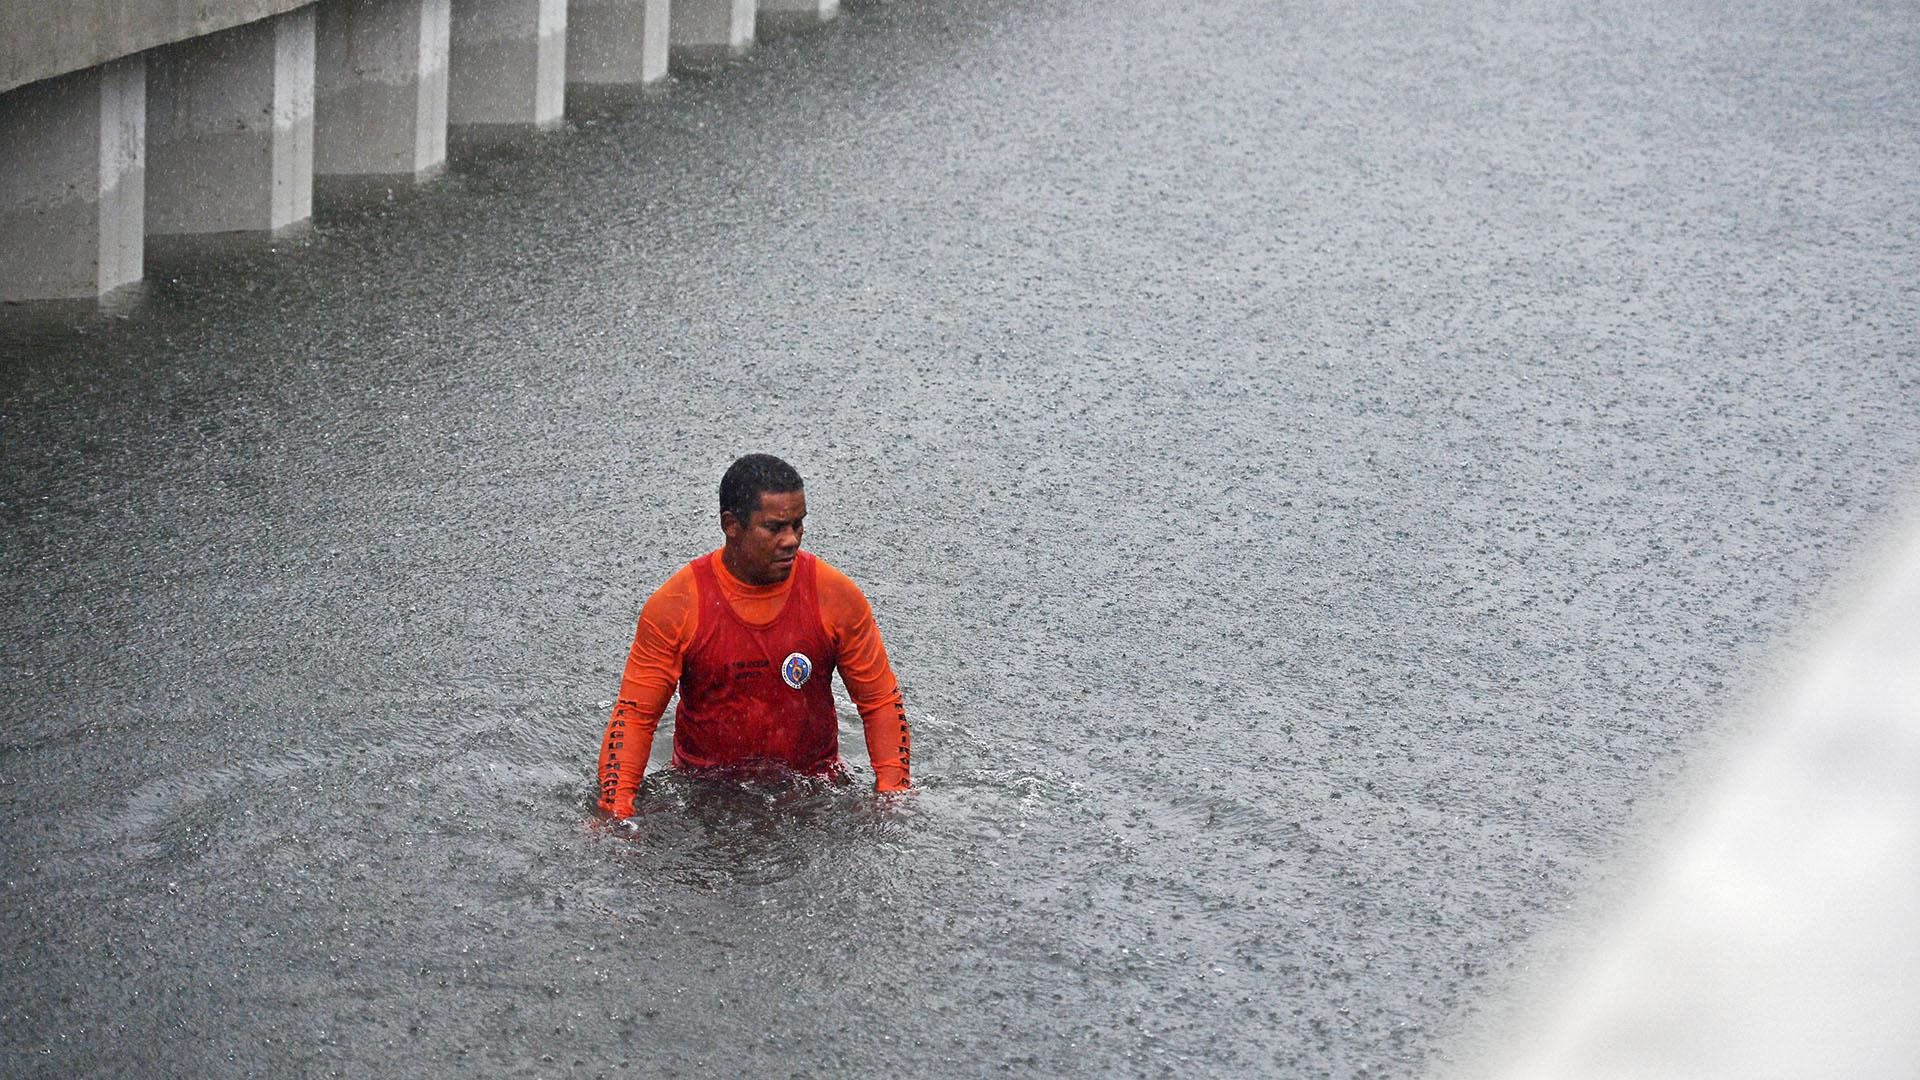 (CARL DE SOUZA / AFP)